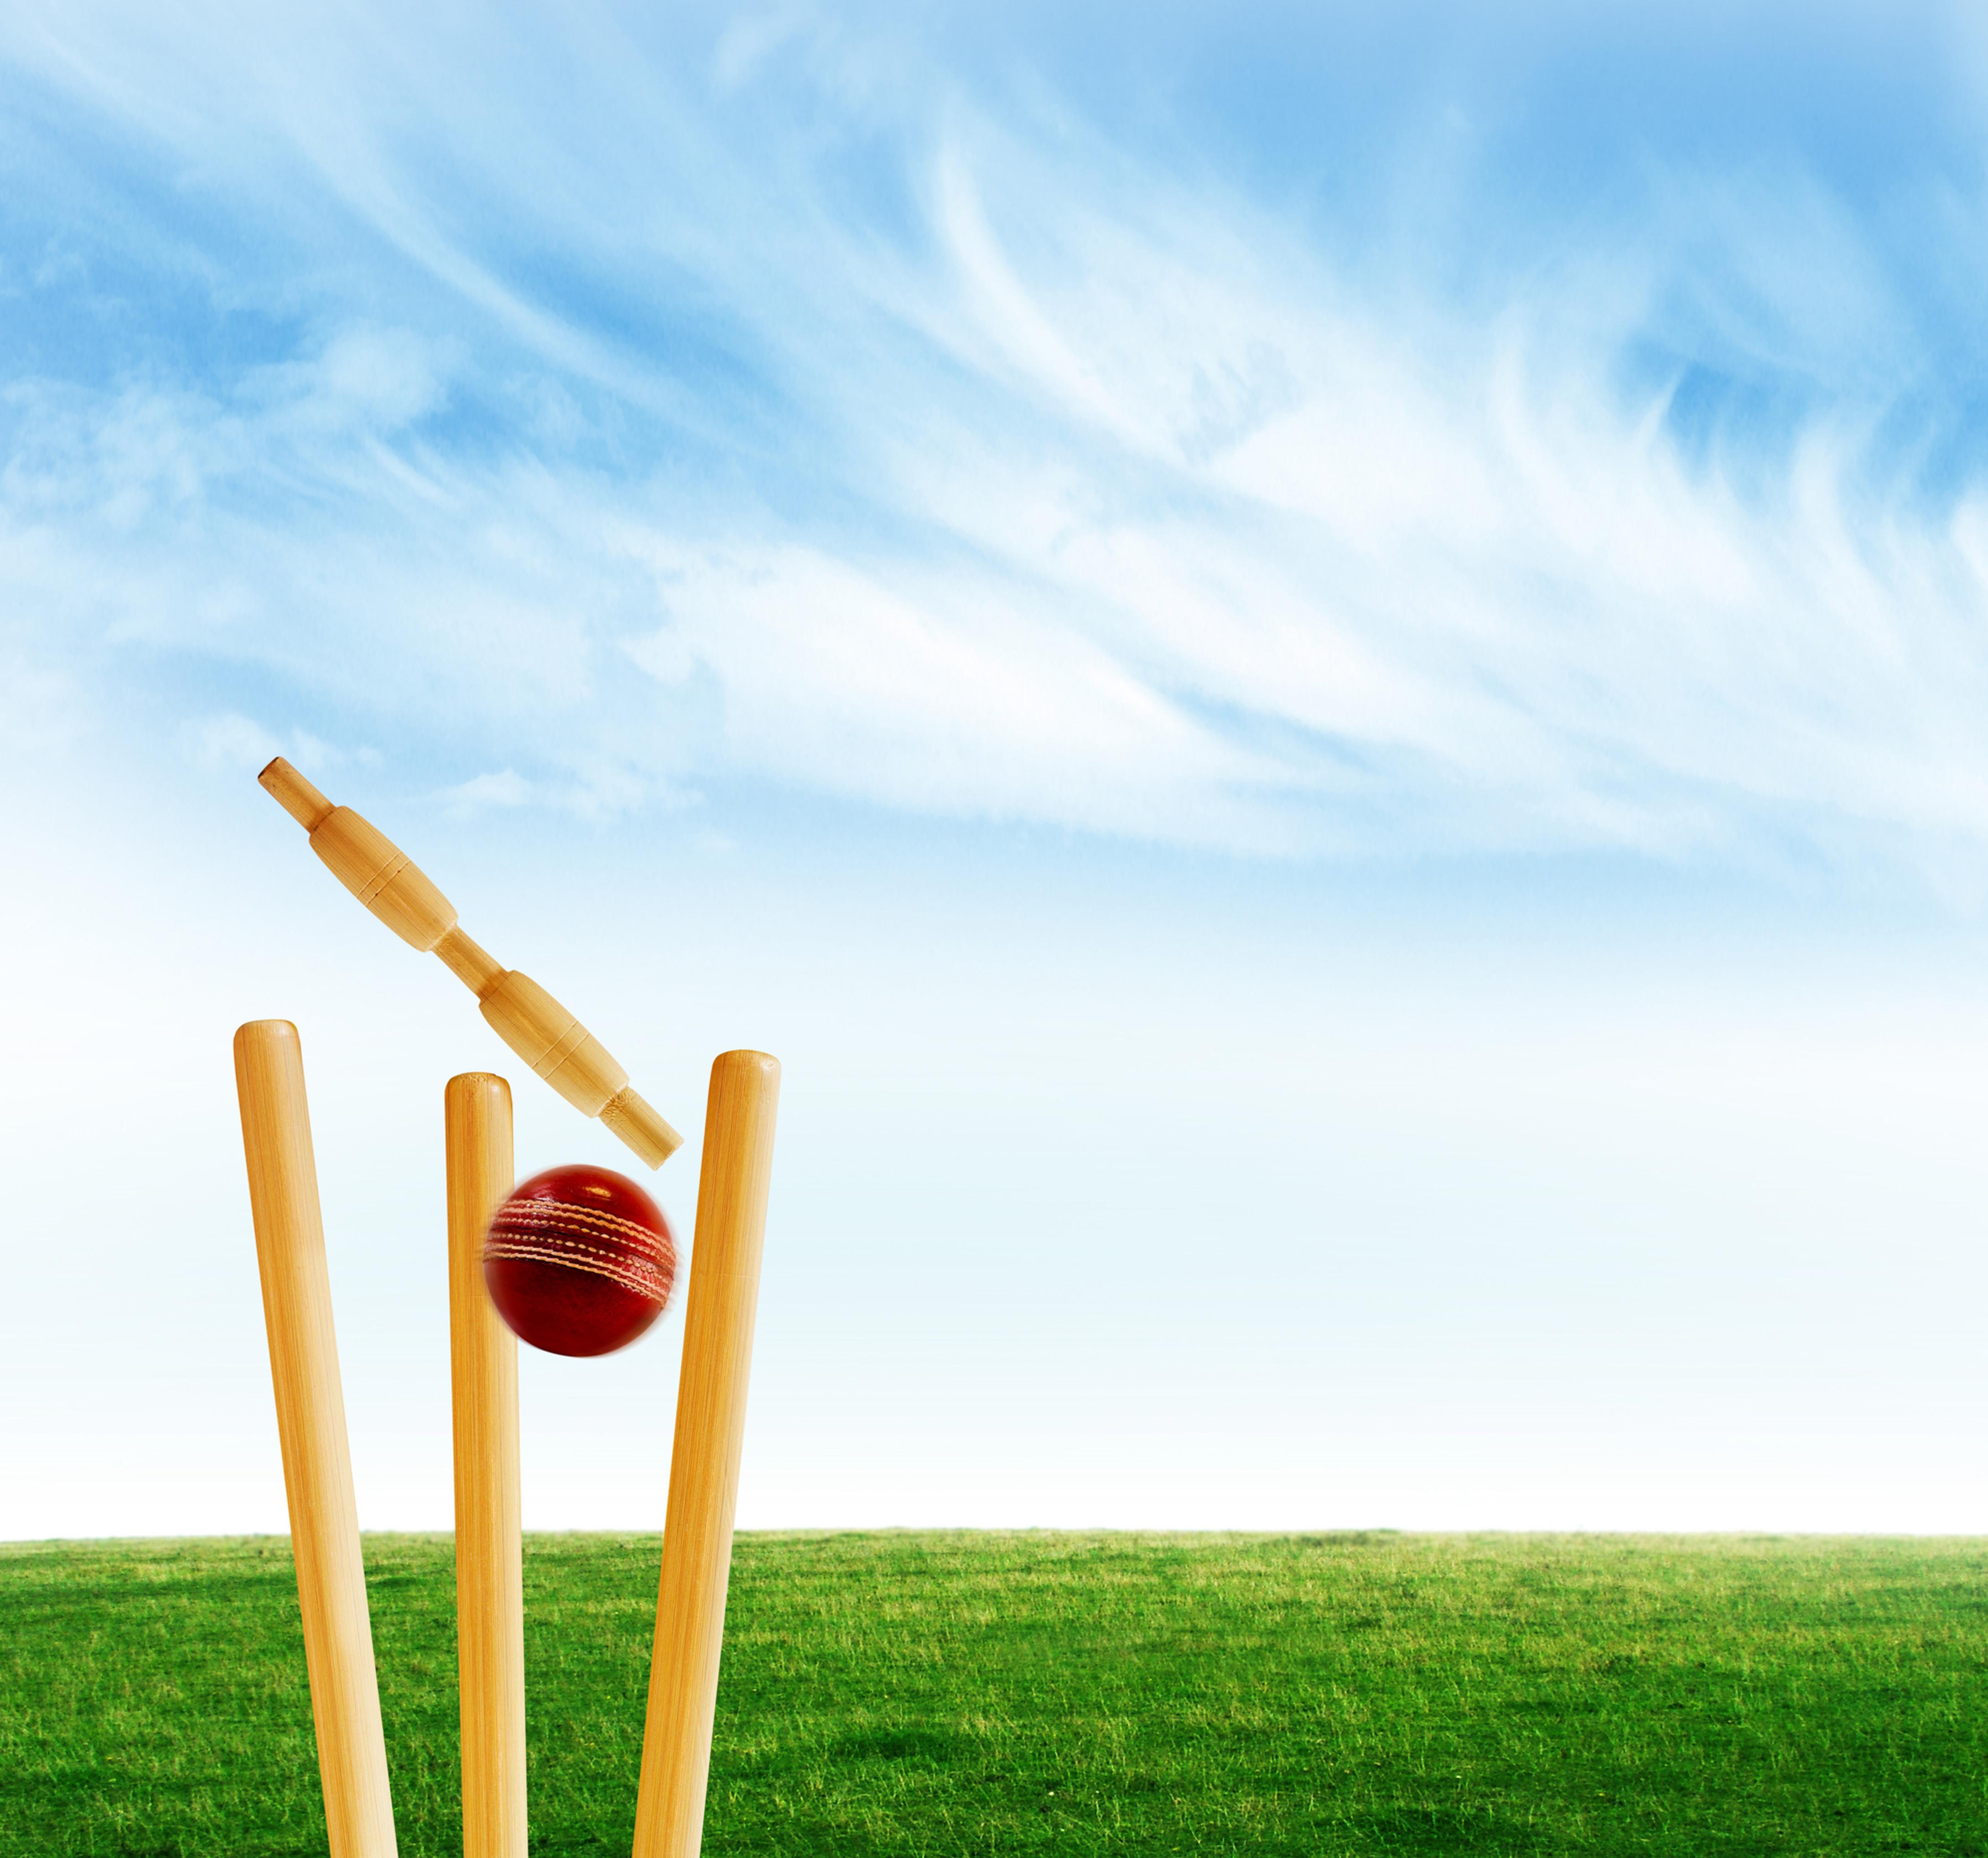 Cricket Net Hire